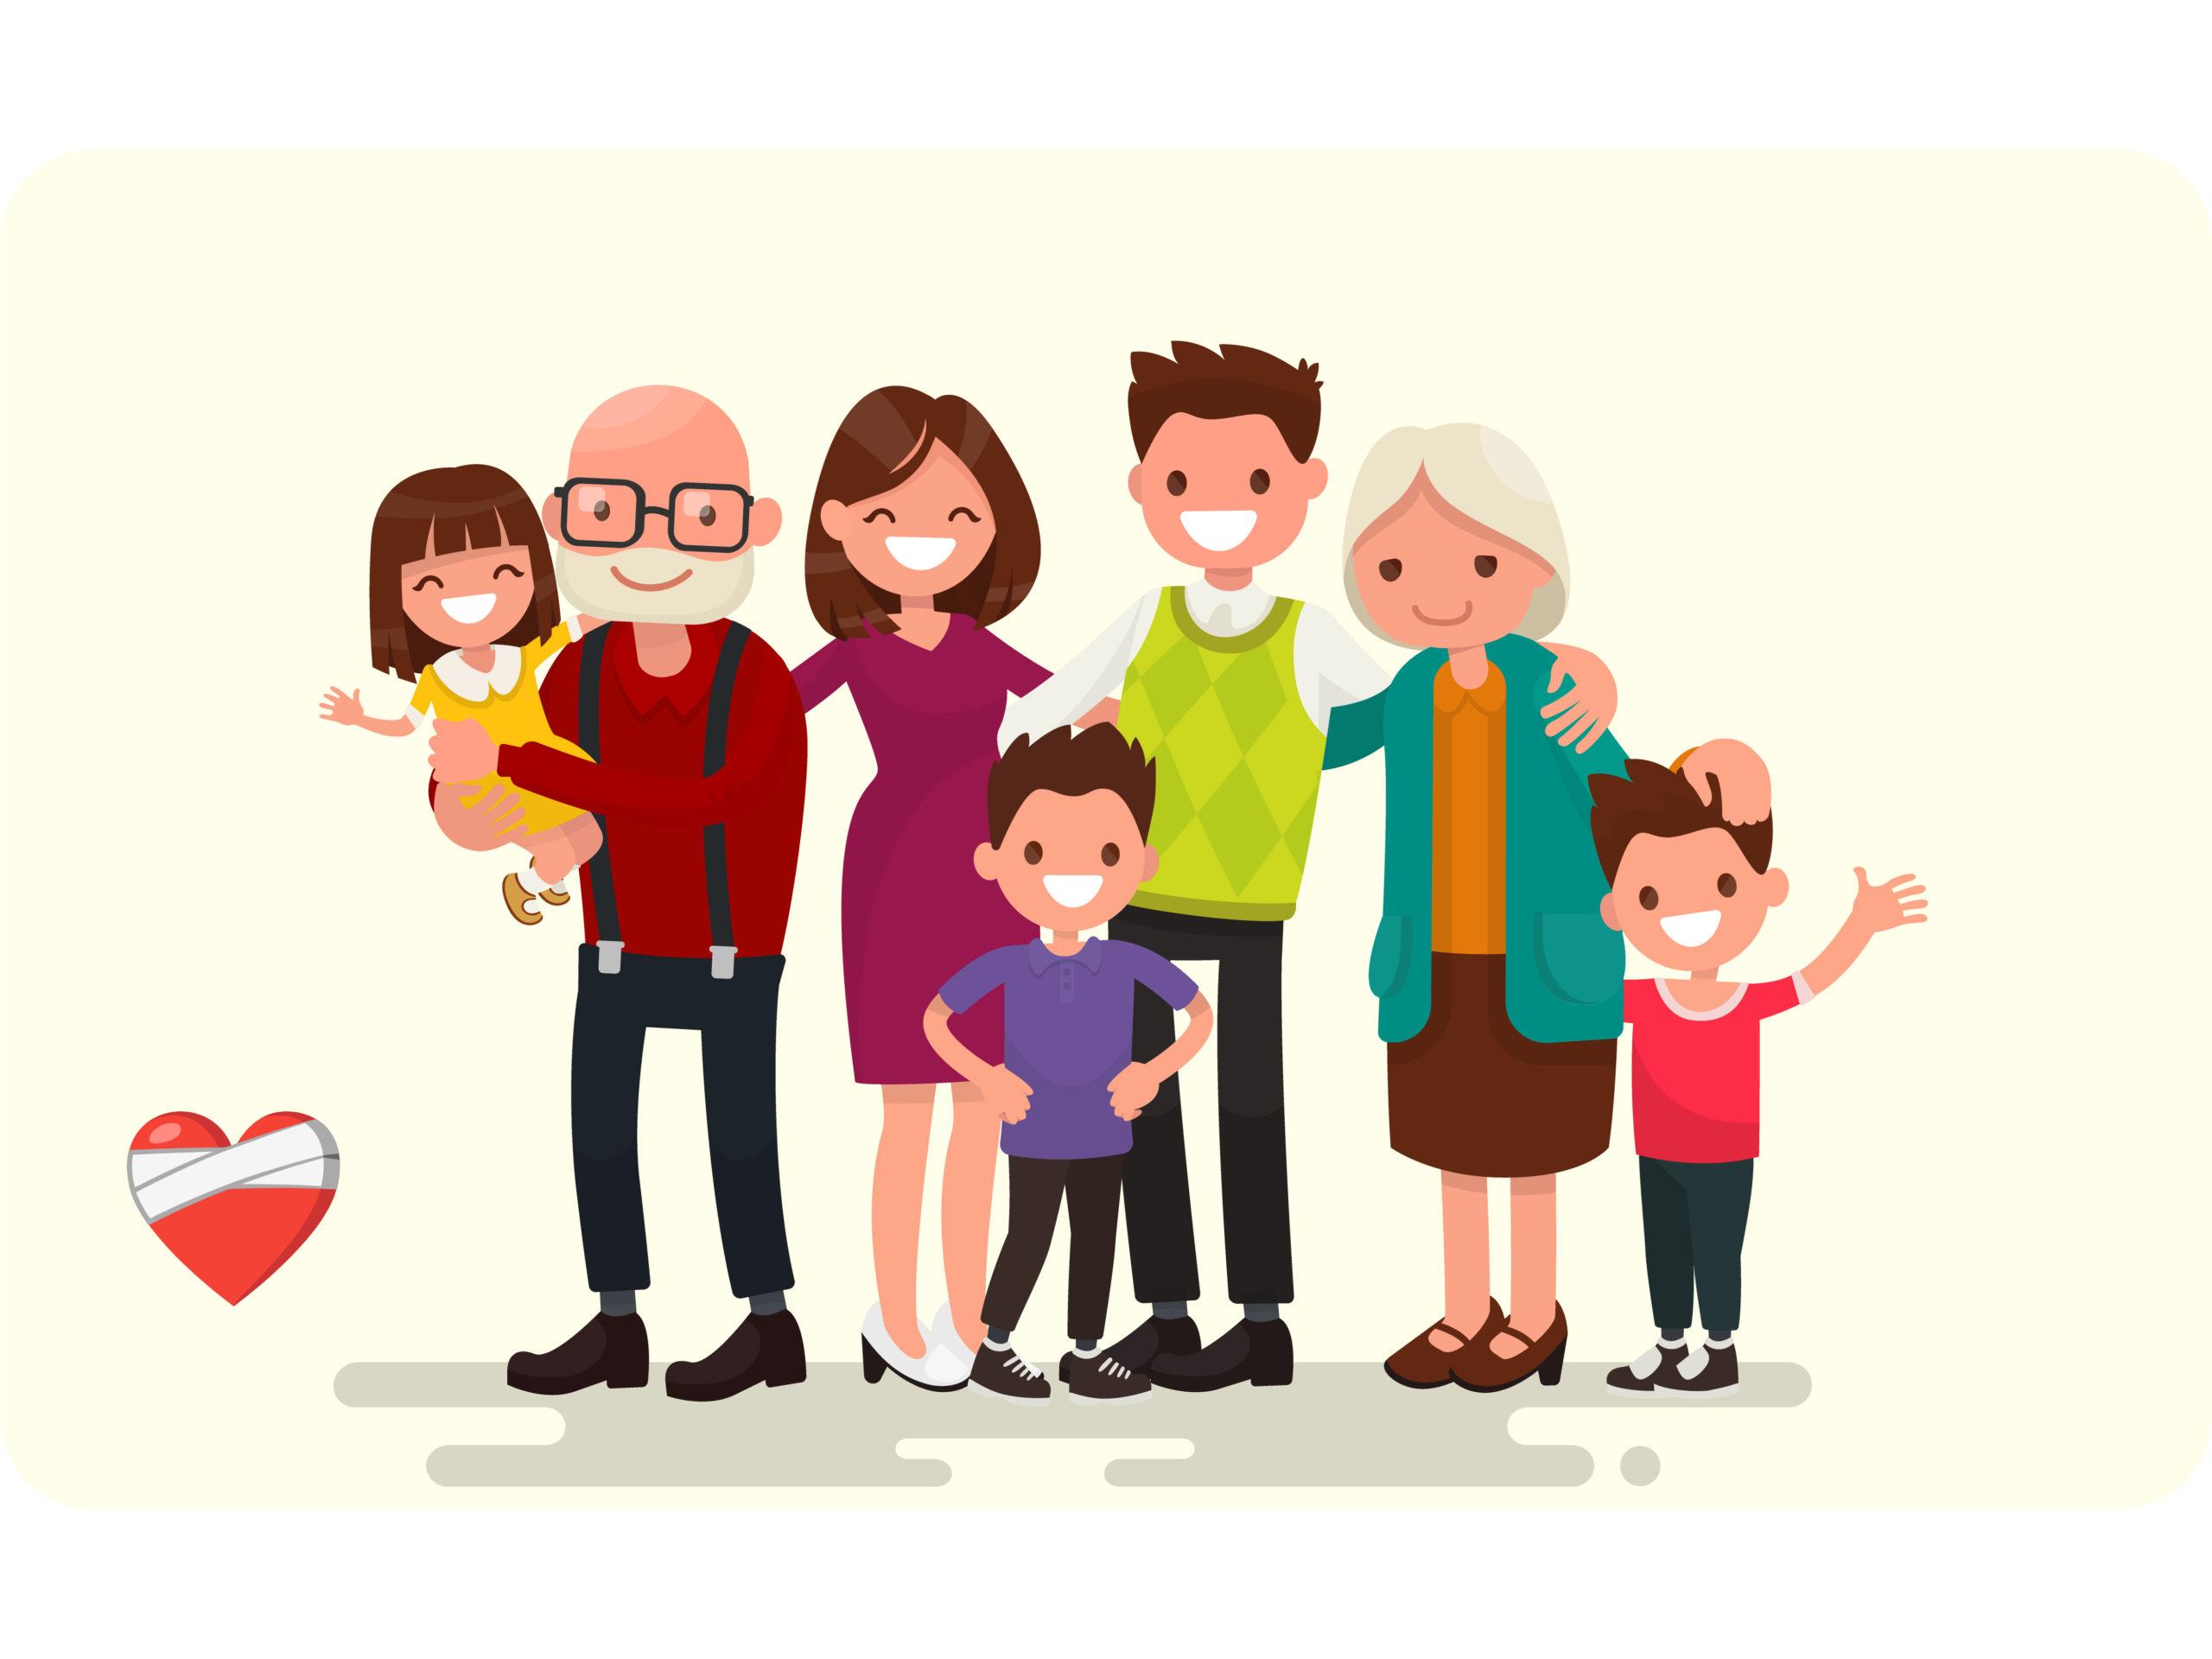 Heart disease: does it run in the family?